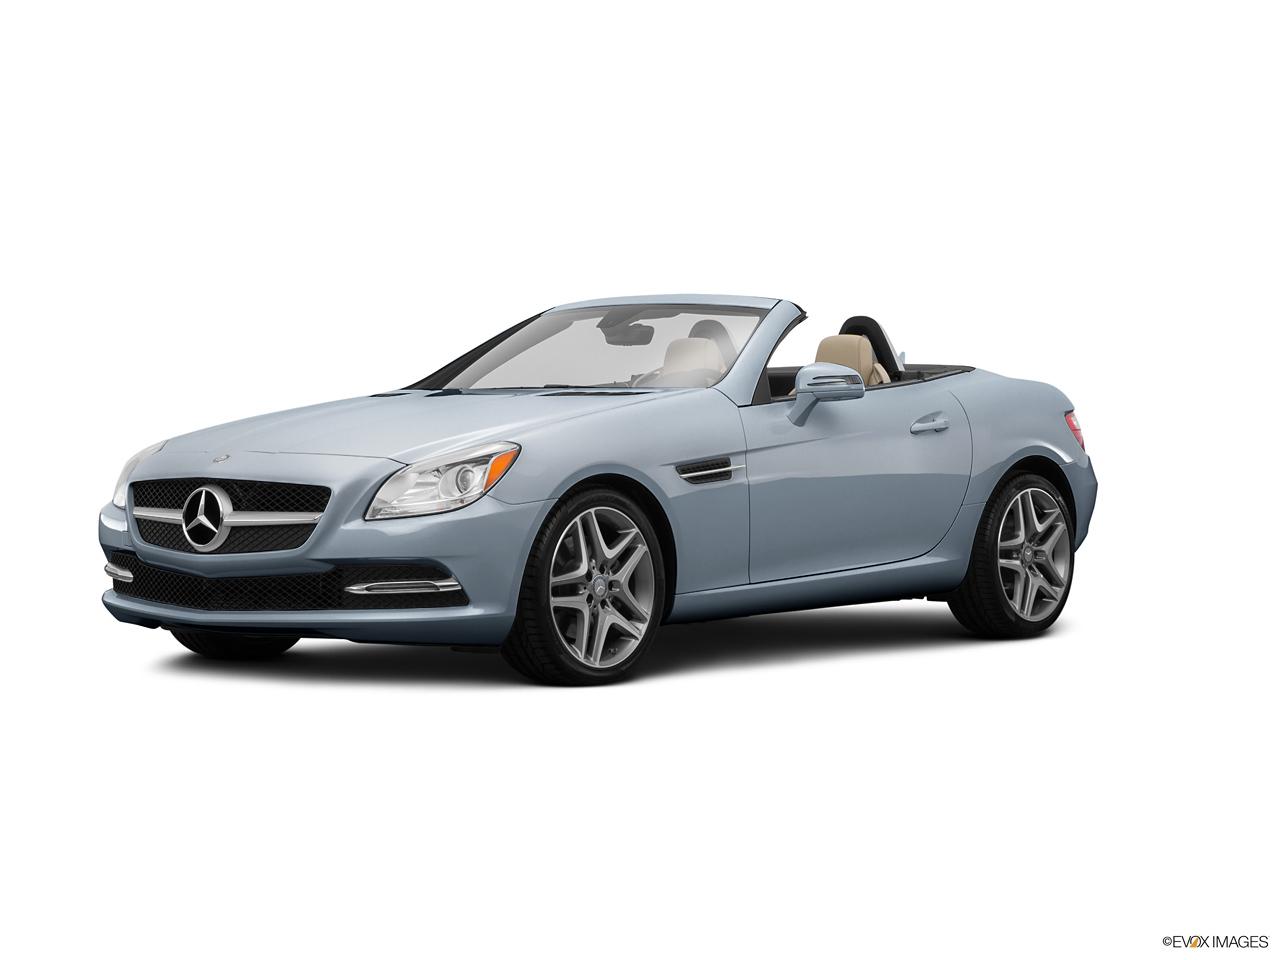 mercedes benz slk class 2016 slk 200 in oman new car. Black Bedroom Furniture Sets. Home Design Ideas